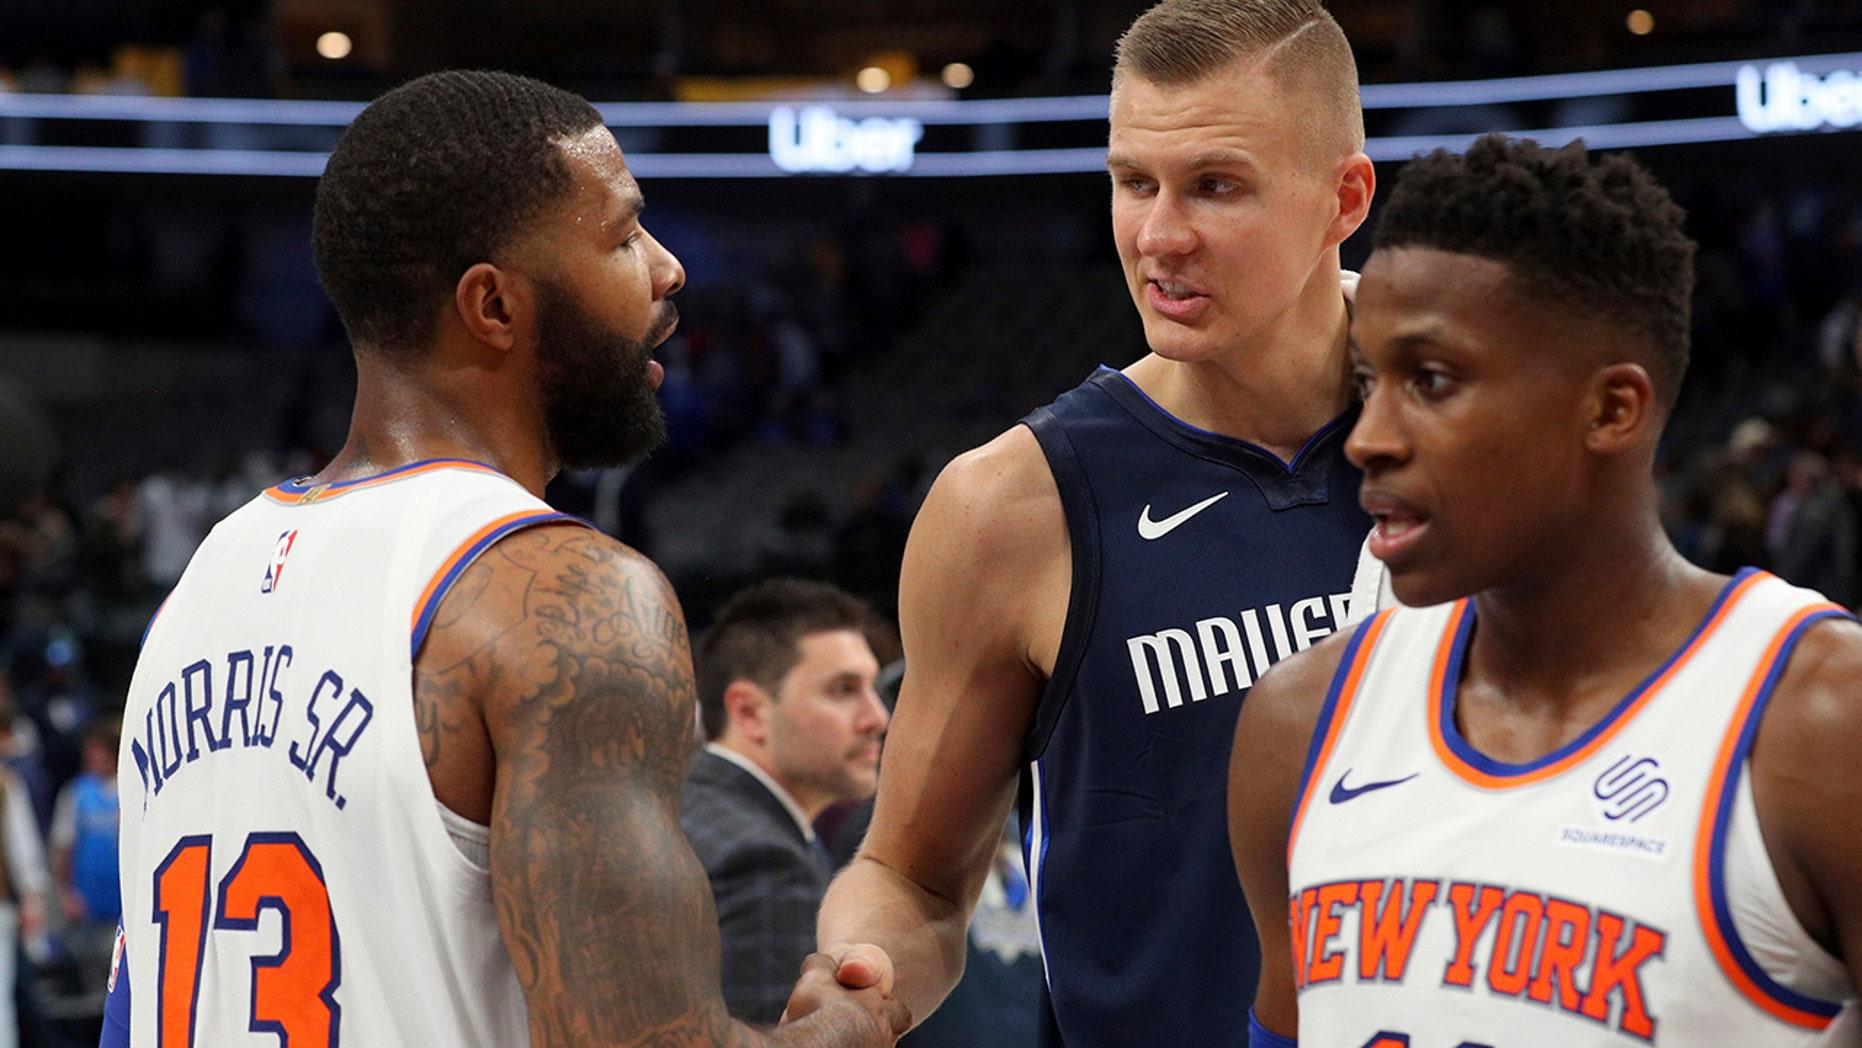 New York Knicks forward Marcus Morris (13) shakes hands with Dallas Mavericks forward Kristaps Porzingis (6) after NBA basketball game Friday, Nov. 8, 2019, in Dallas. (AP Photo/Richard W. Rodriguez)